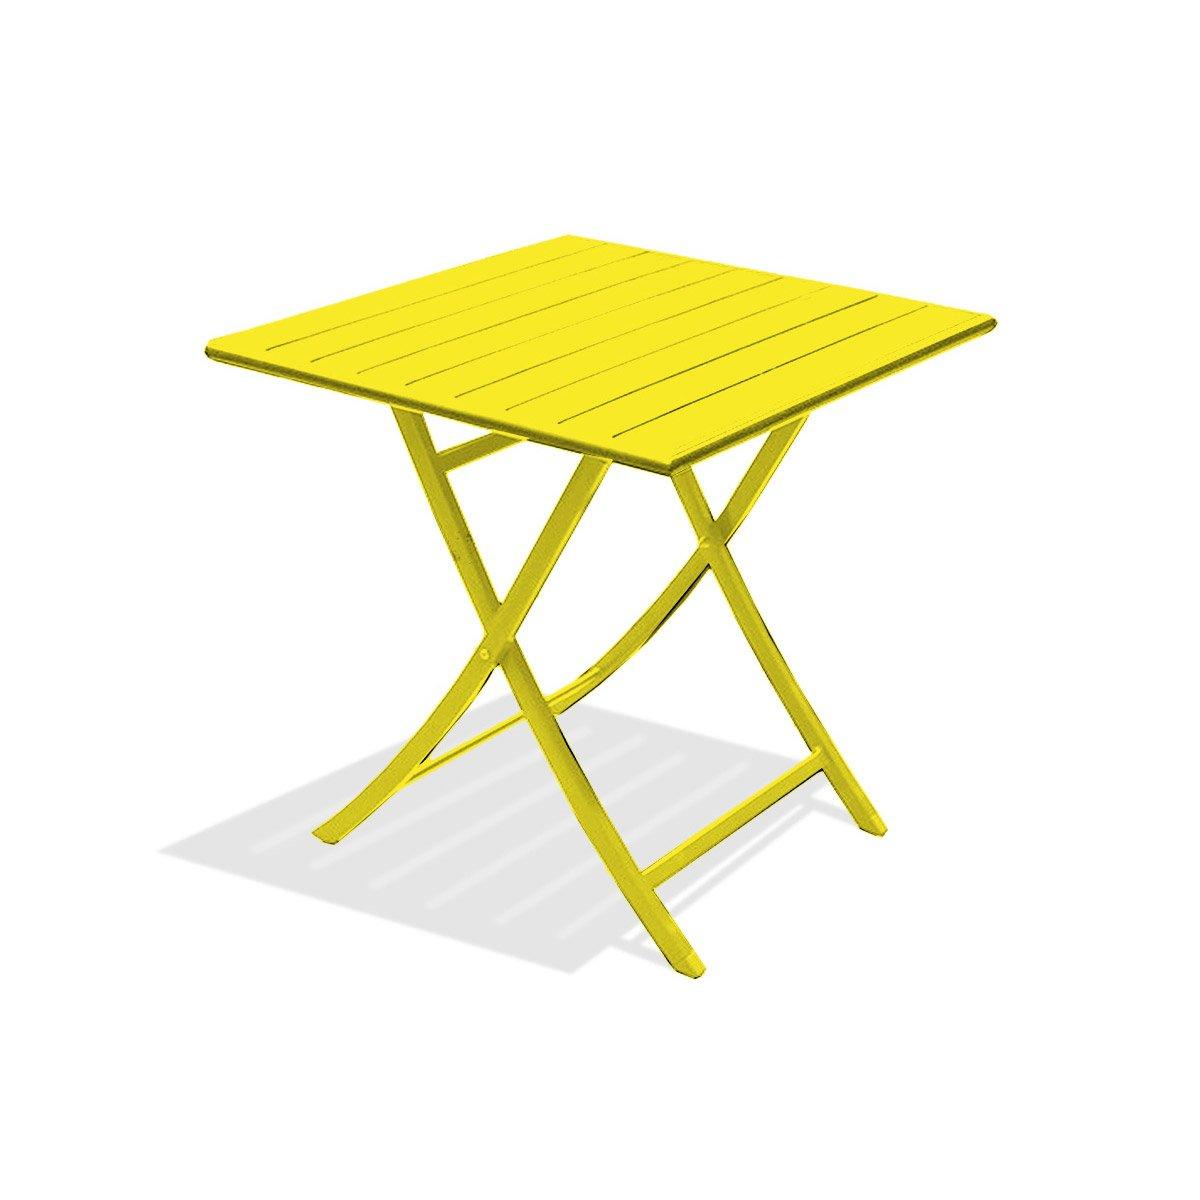 table de jardin marius carr e jaune zinc 2 personnes leroy merlin. Black Bedroom Furniture Sets. Home Design Ideas